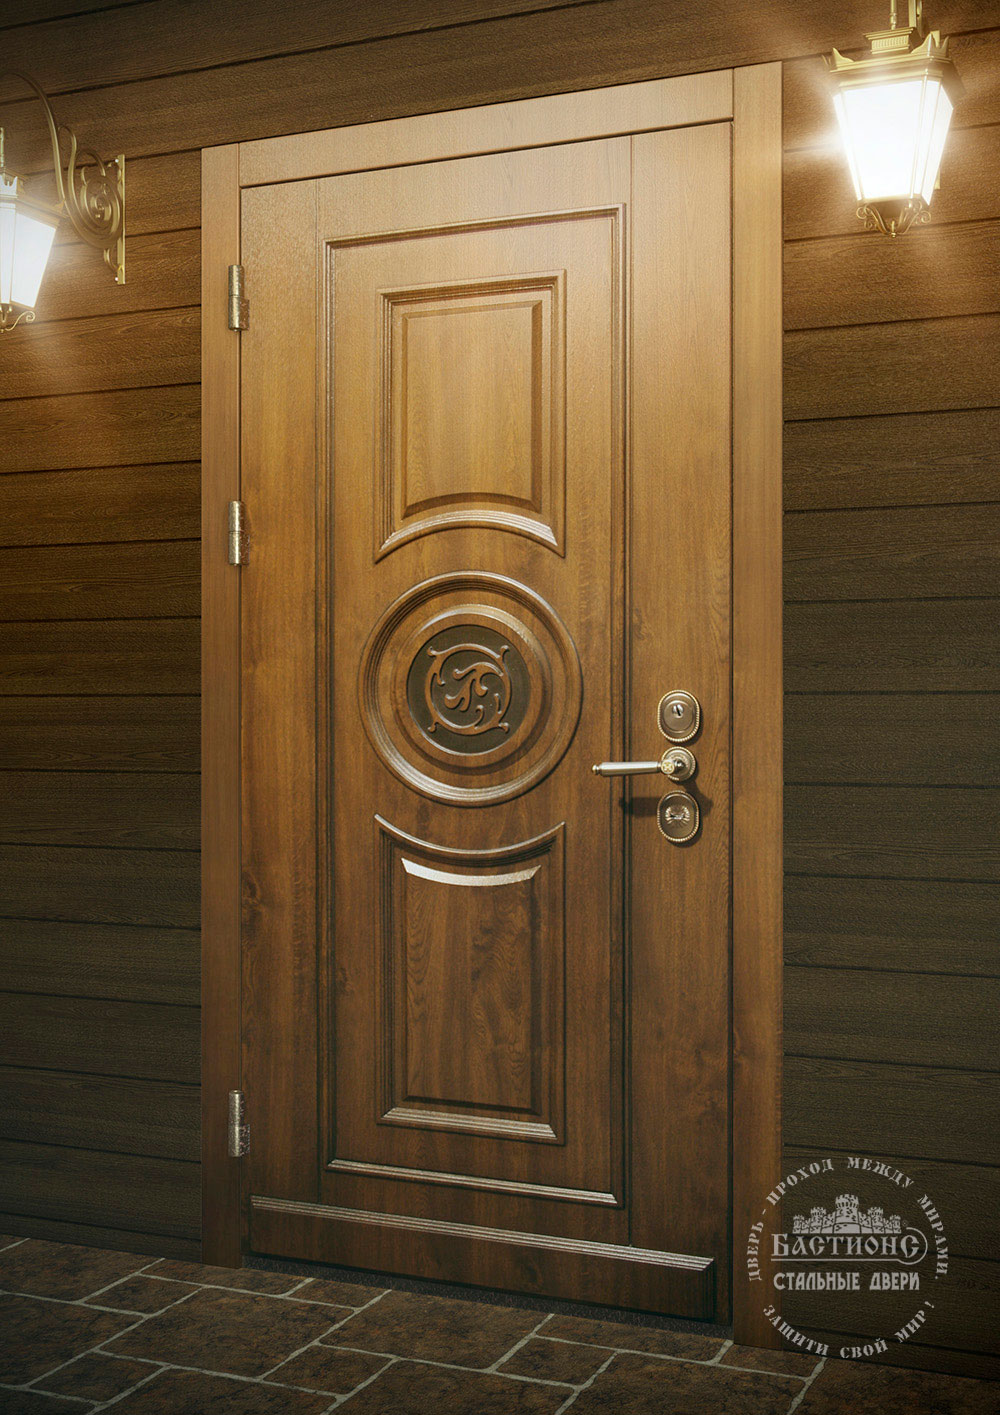 Дверь Бастион-с Оптима отделка шпон ПВХ